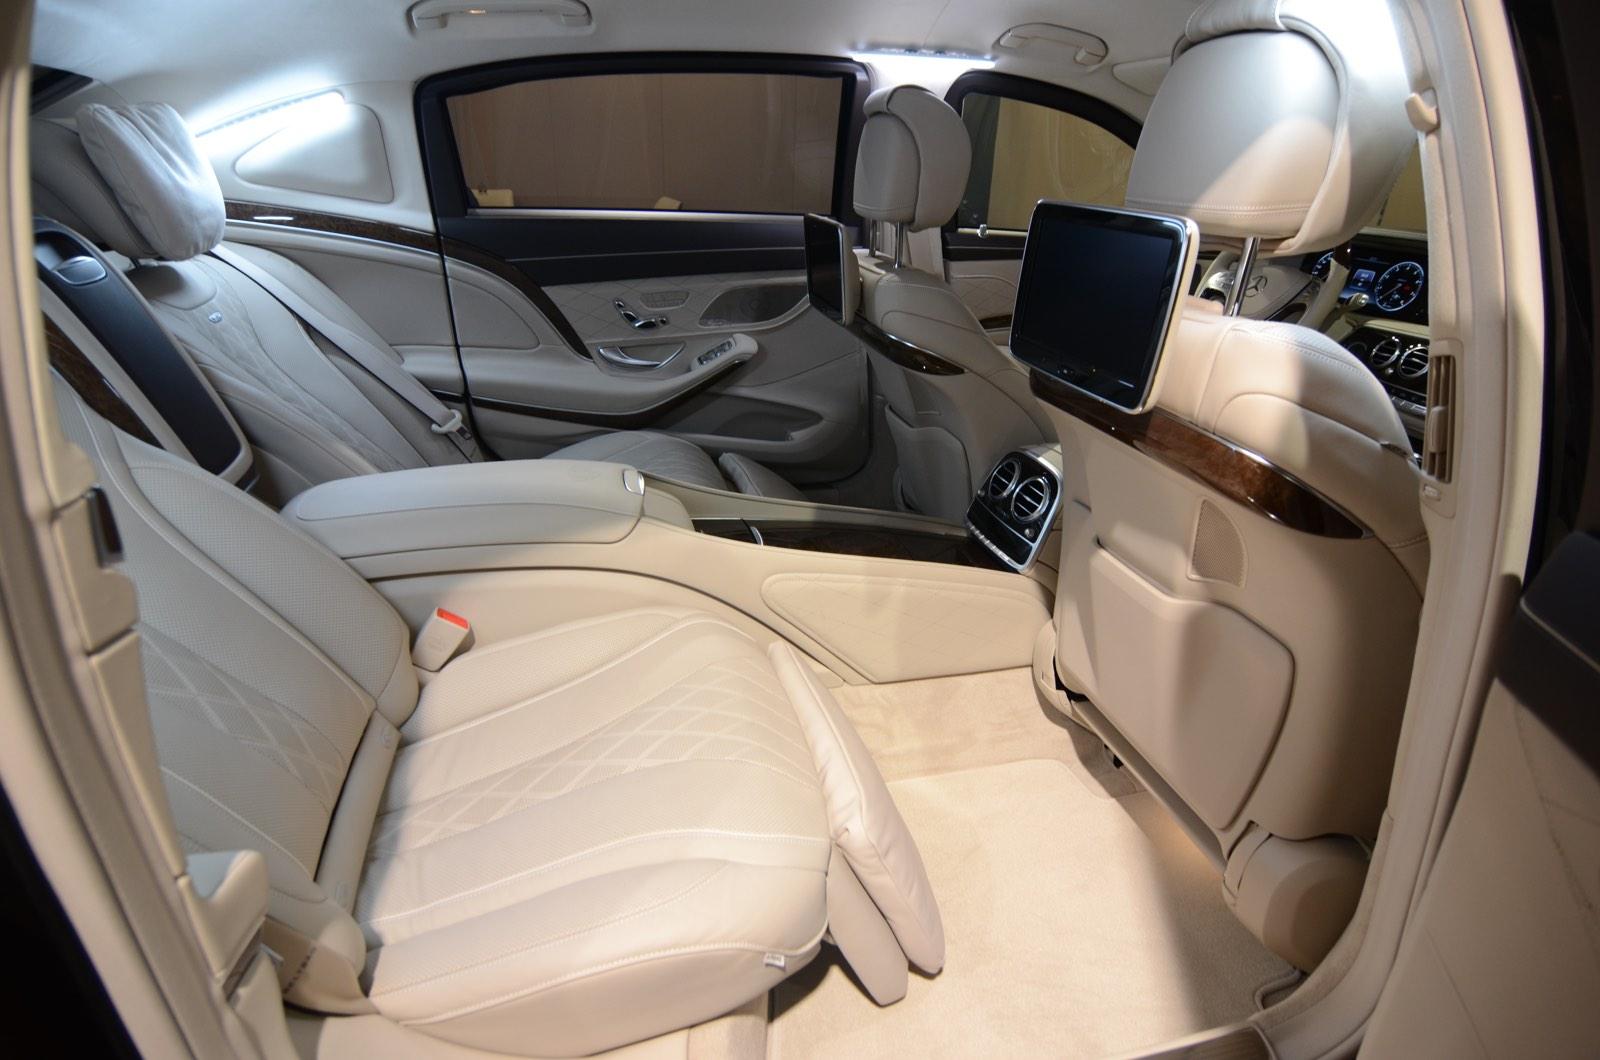 http://gtspirit.com/wp-content/uploads/2016/03/Mercedes-Maybach-S-600-Guard-at-Geneva-Motor-Show-20167.jpg